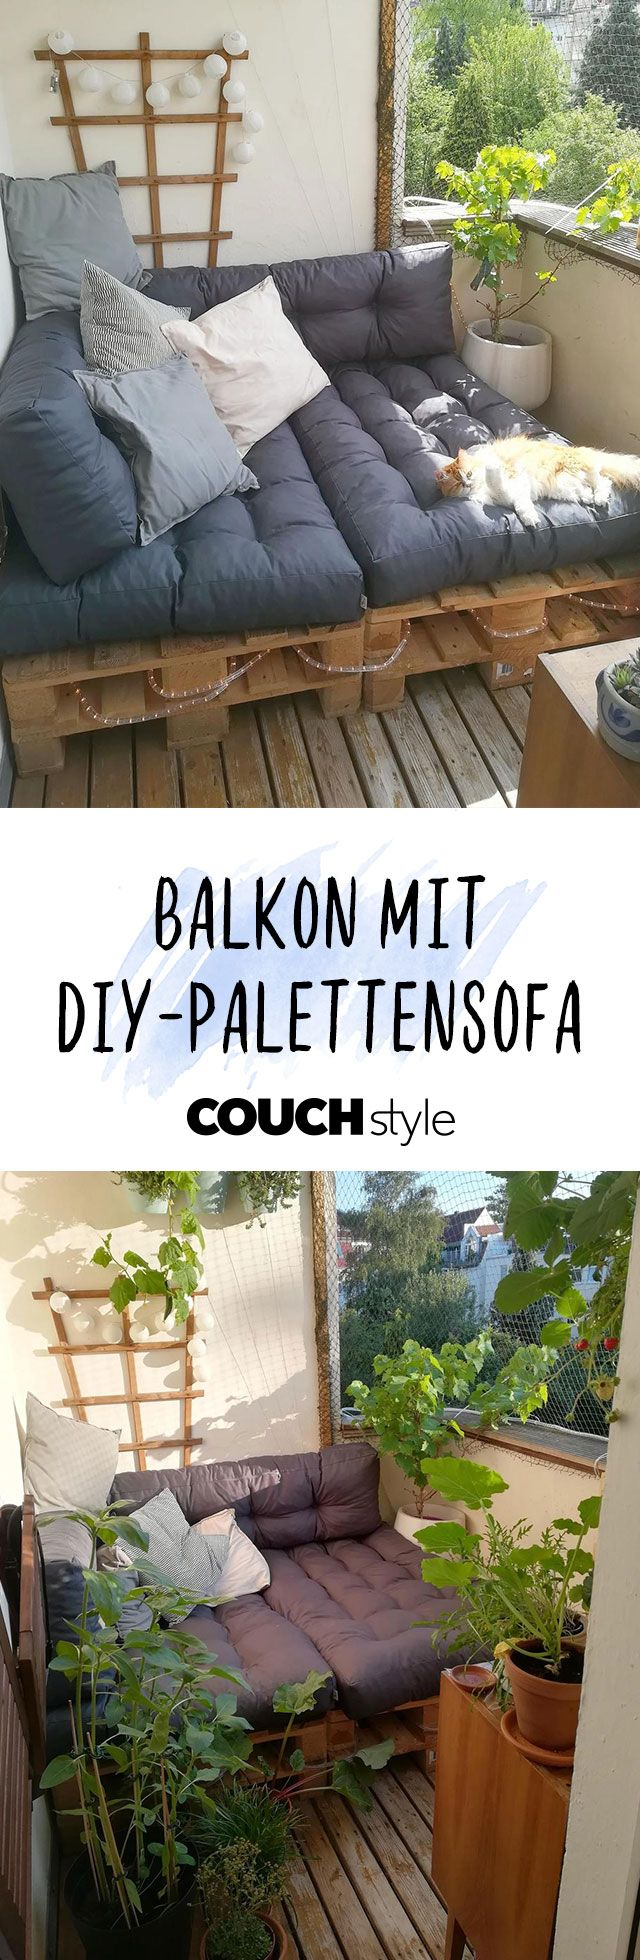 #palettensofa #palettenmöbel #balkon #balkonien #bal...